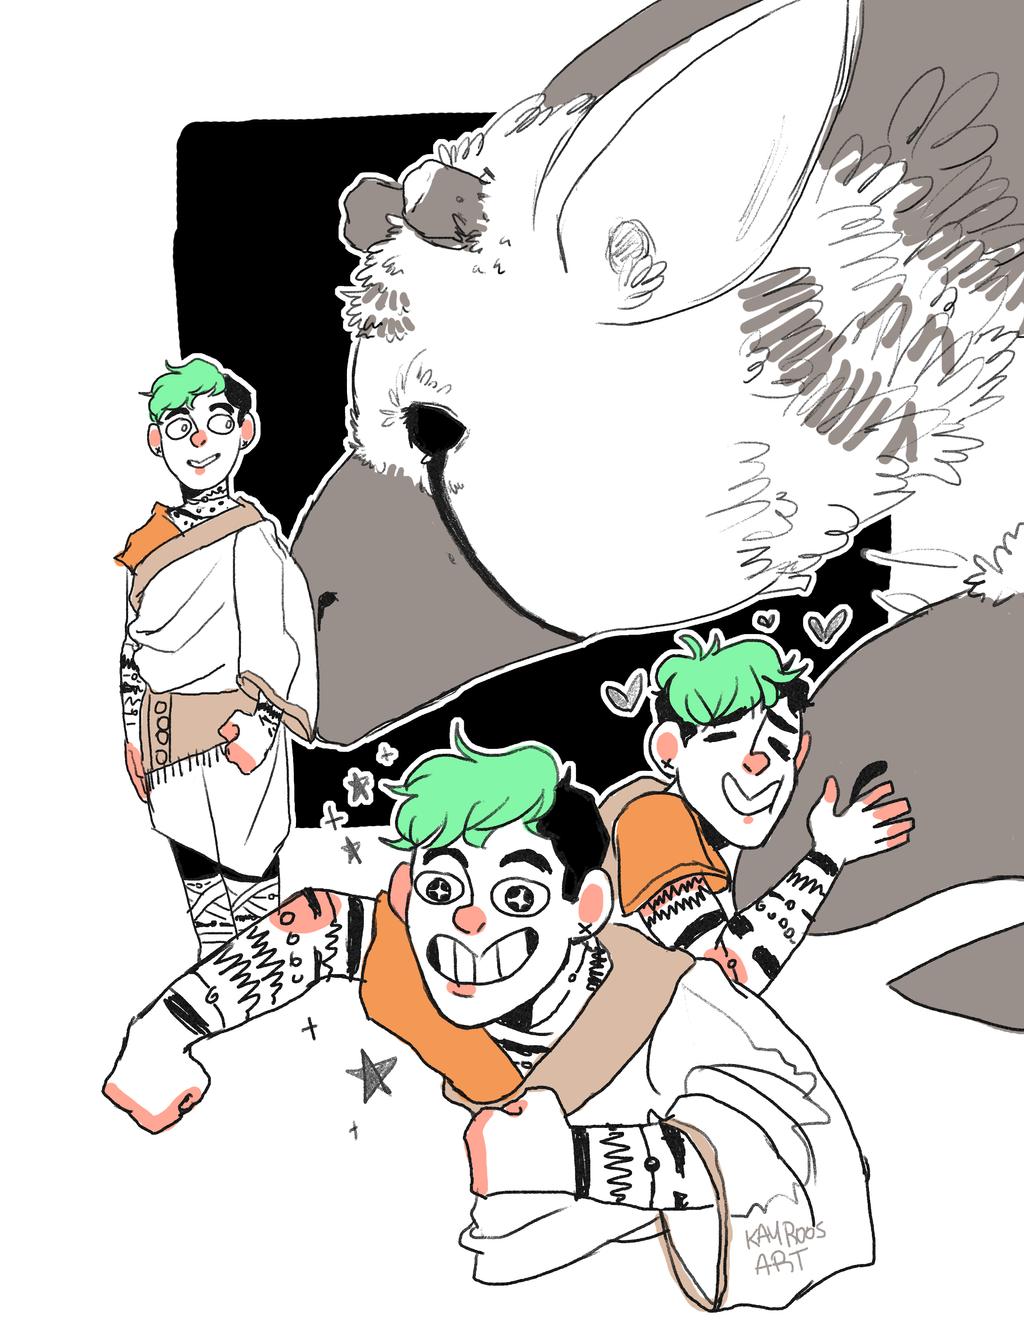 The last guardian jack doodles by kayroos on deviantart for Decor 52 fan celano ma dw